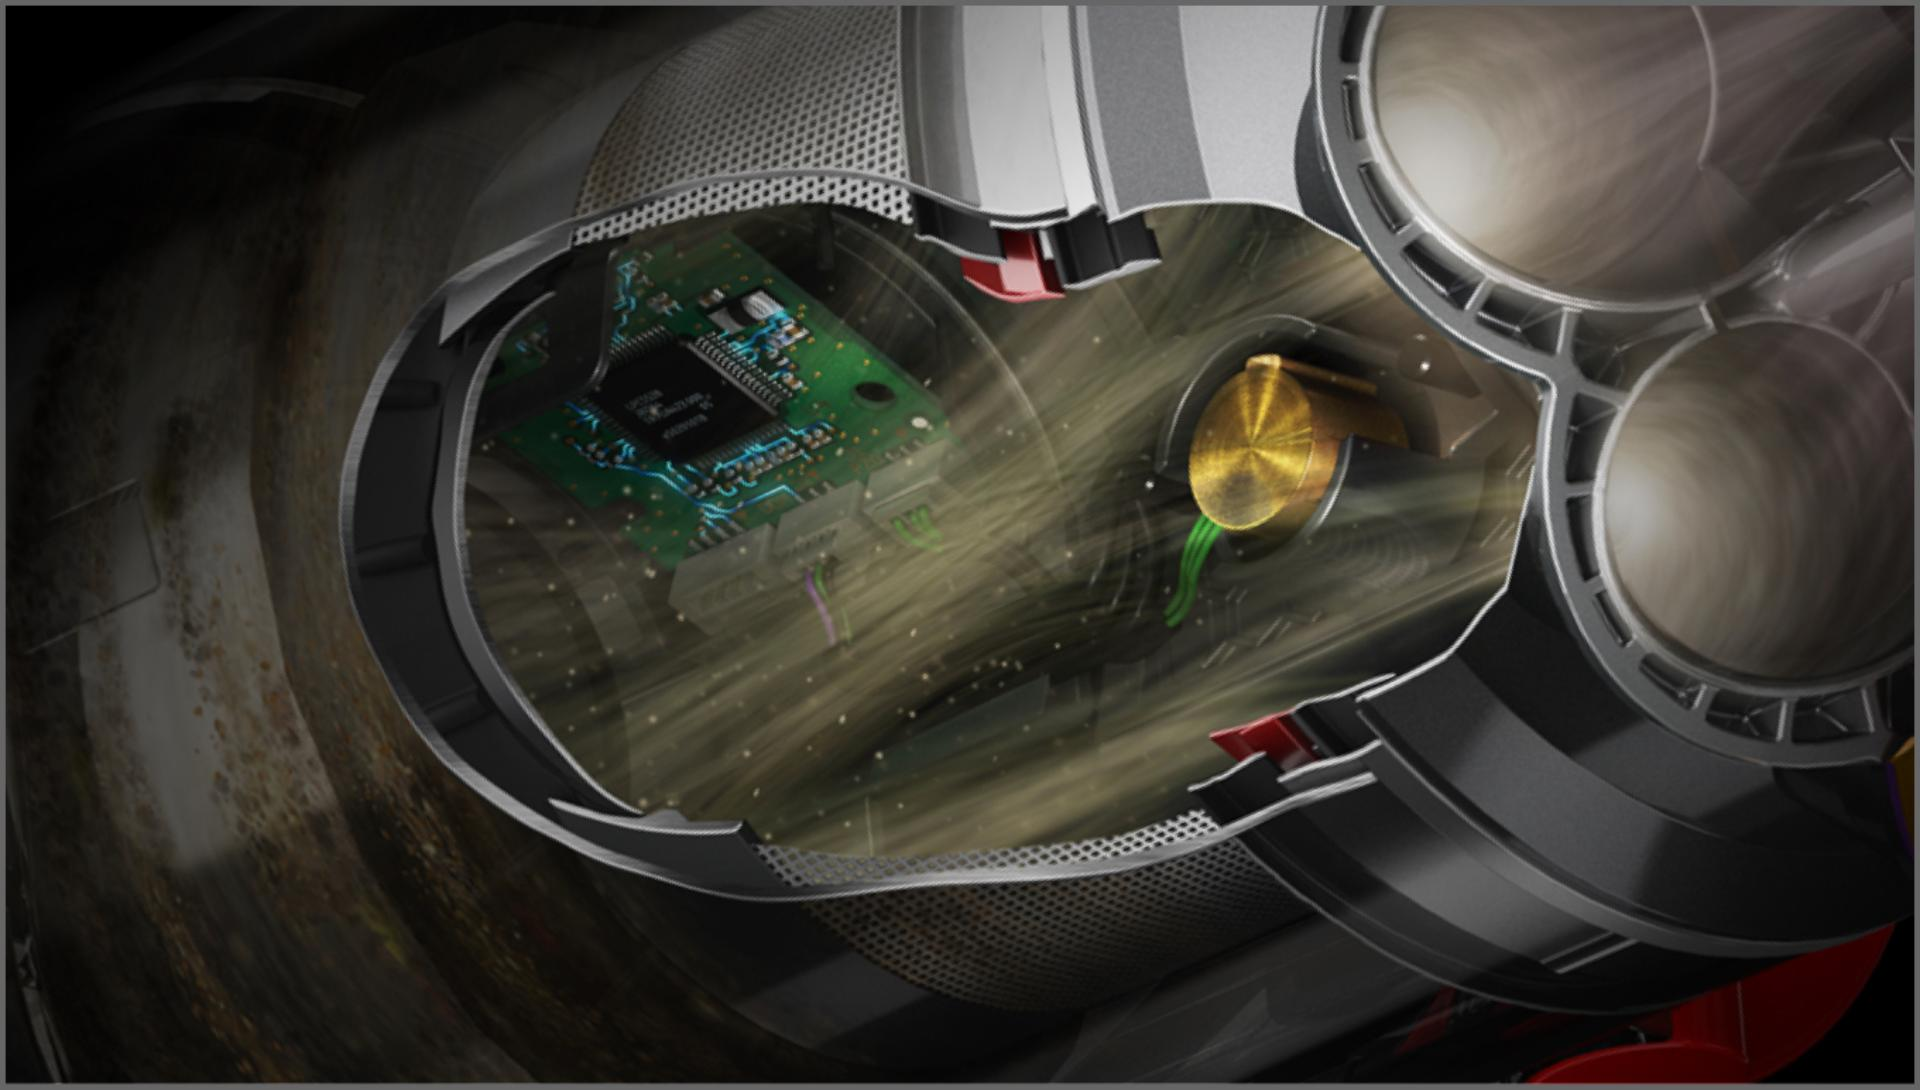 Cutaway of vacuum body showing location of piezo sensor